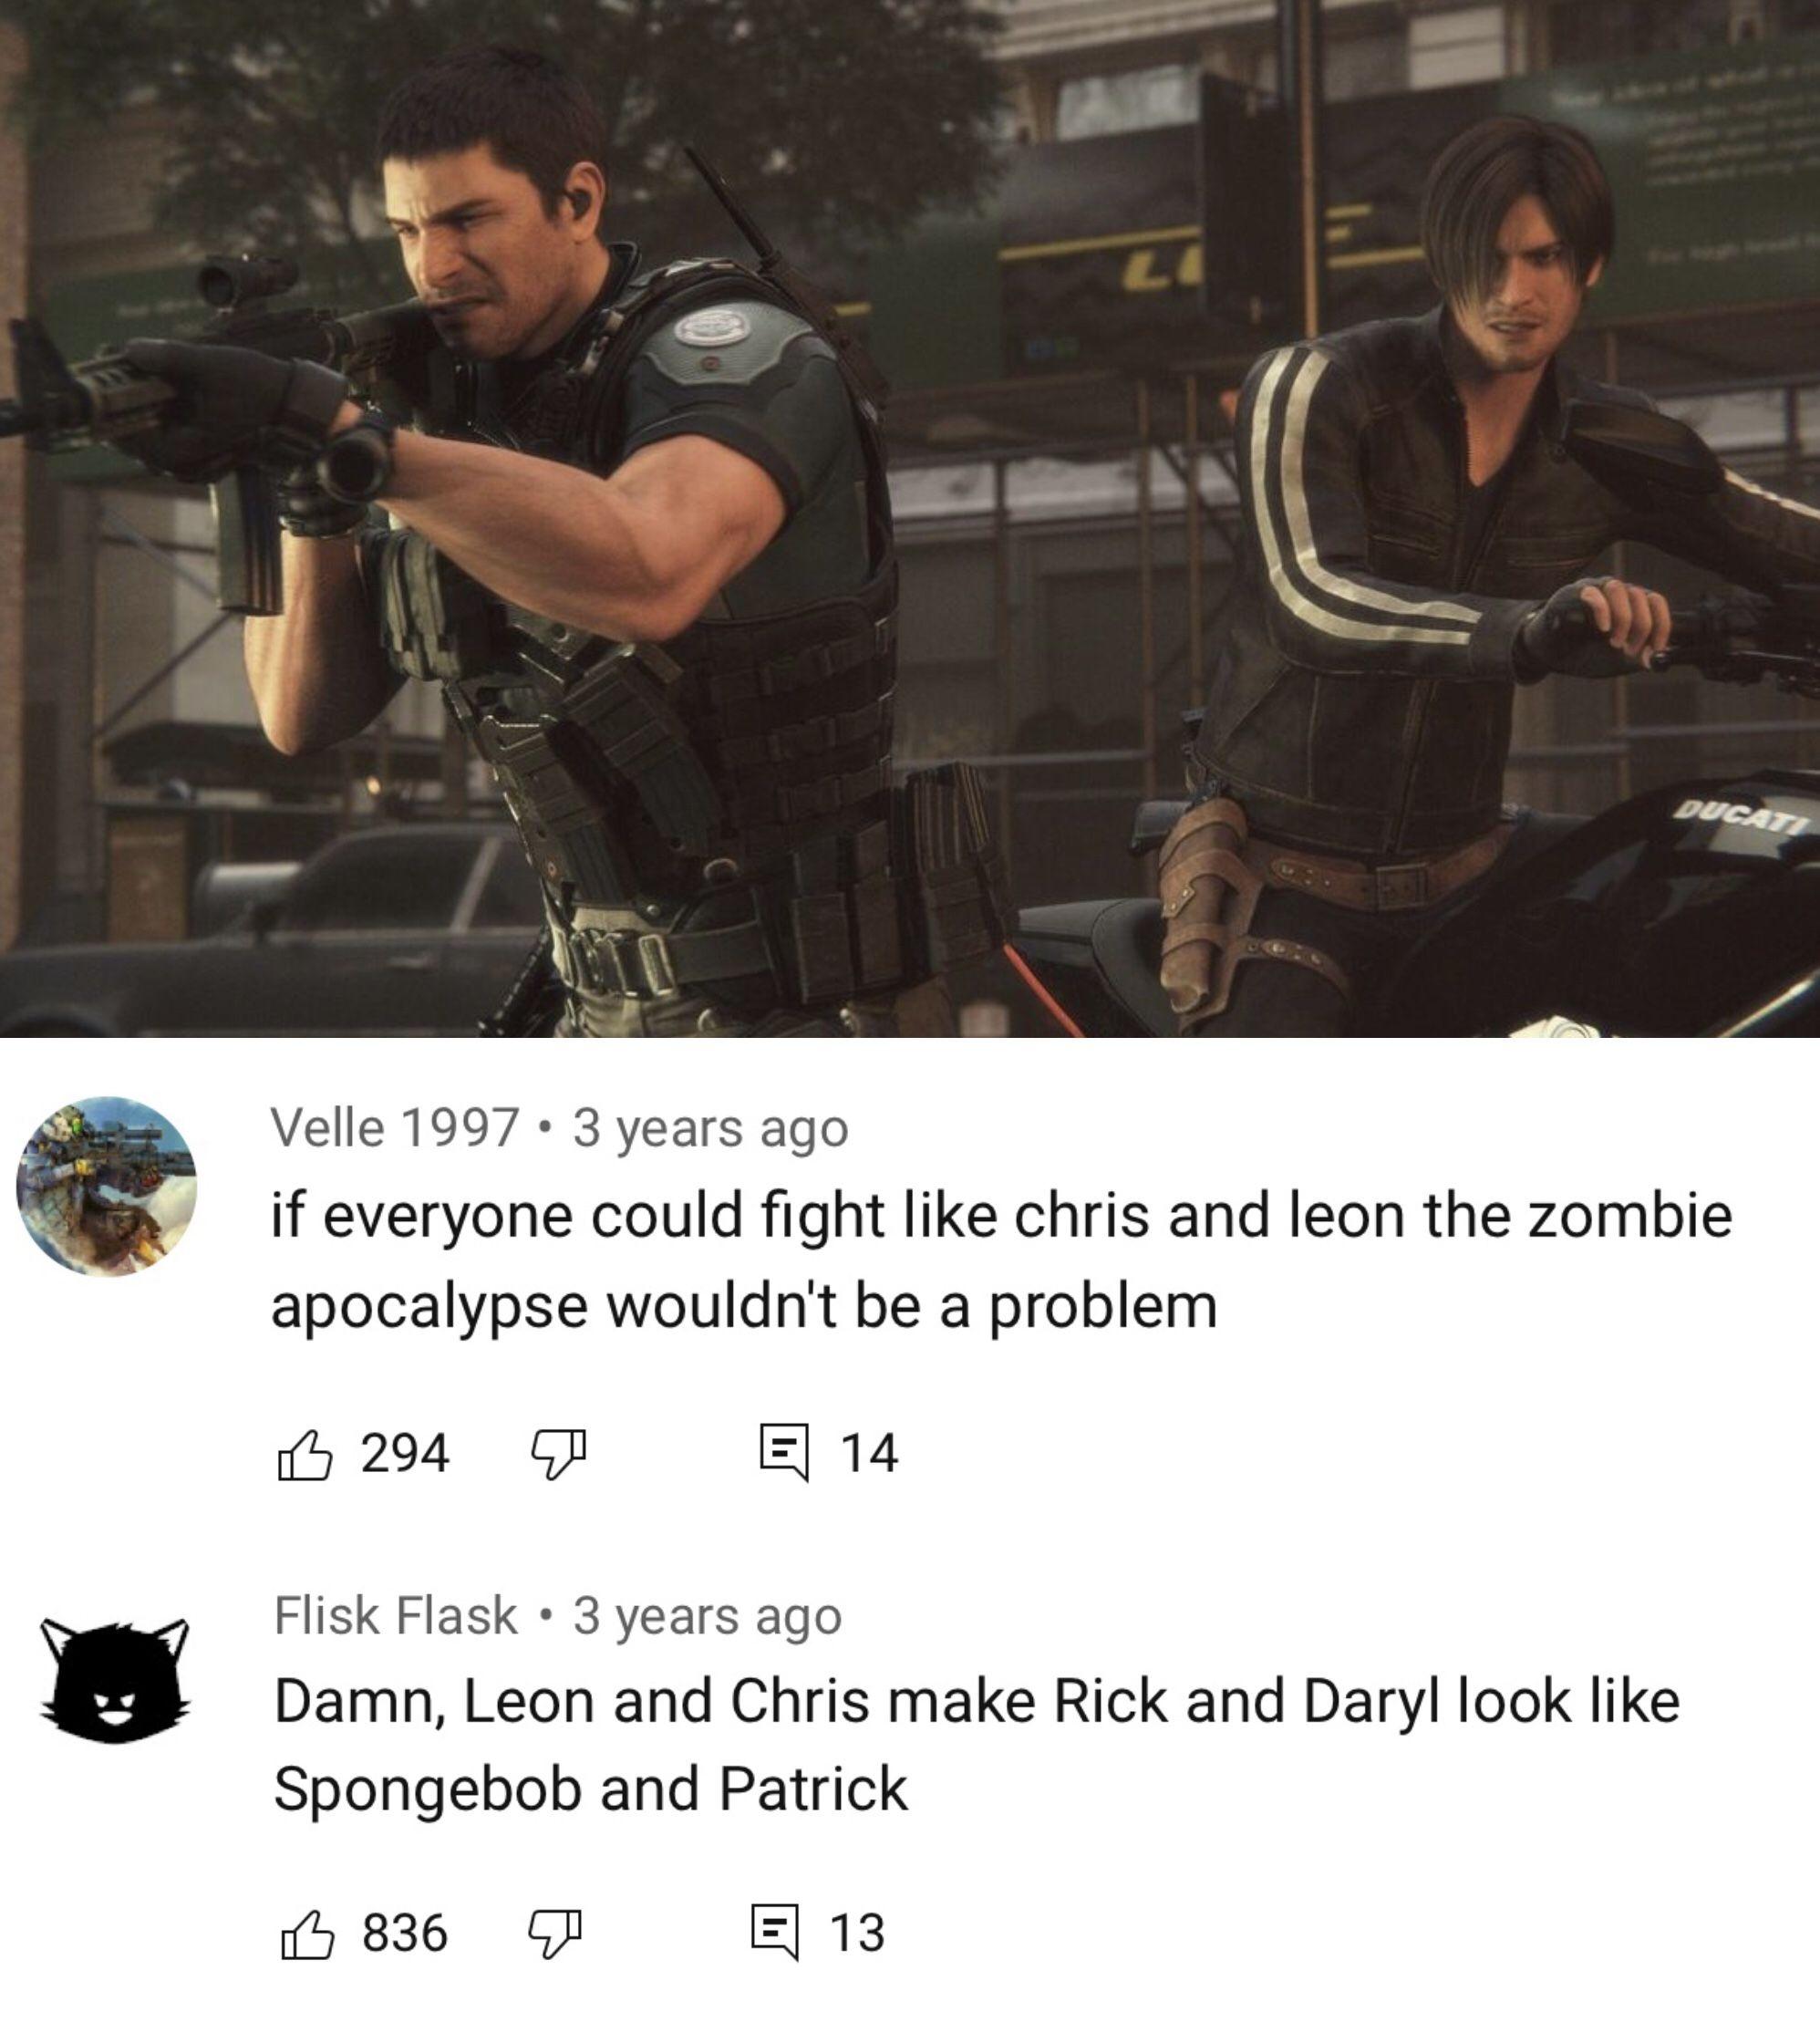 Pin By Ricardo Fuentes On Chris Redfield In 2021 Resident Evil Game Resident Evil Evil